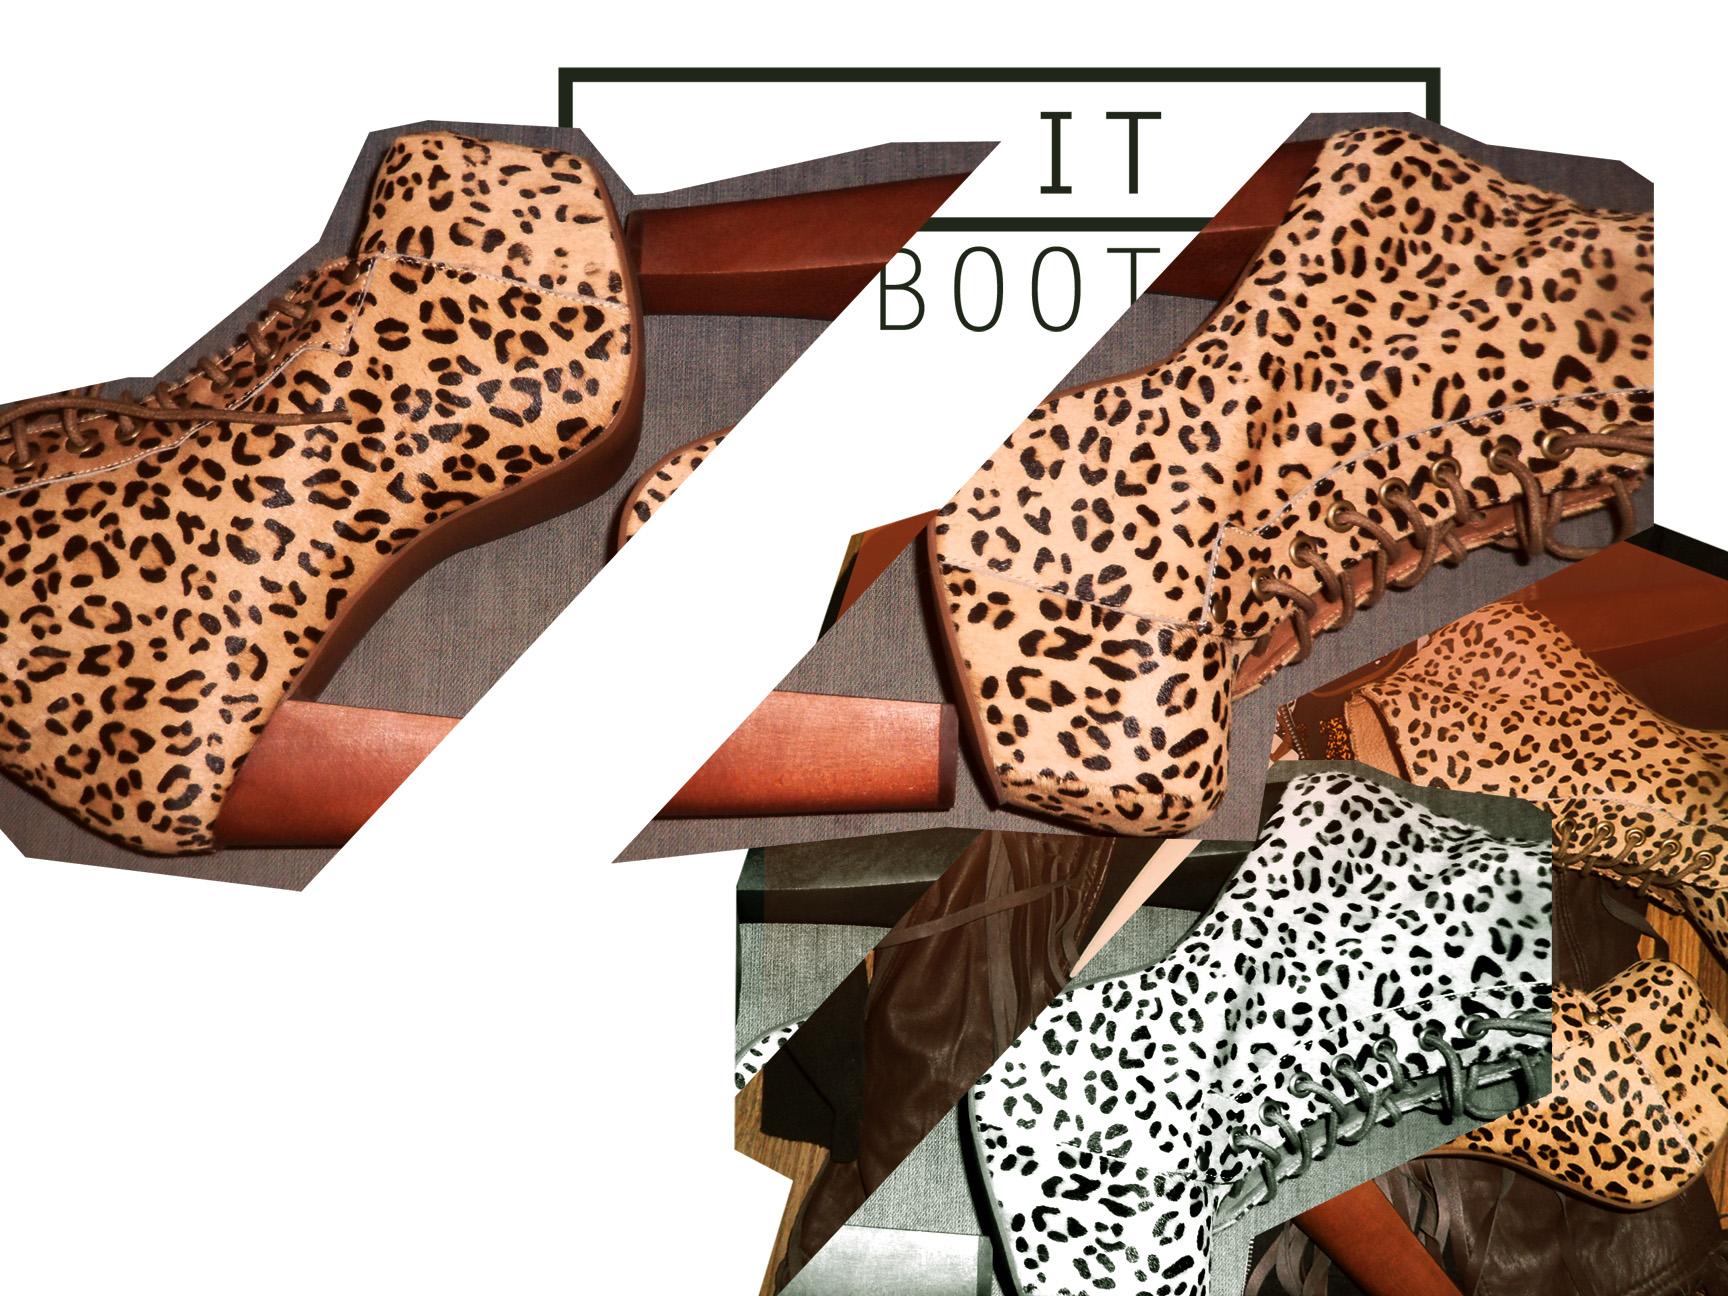 Jeffrey-Campbell-ITBOOT-Cheetah